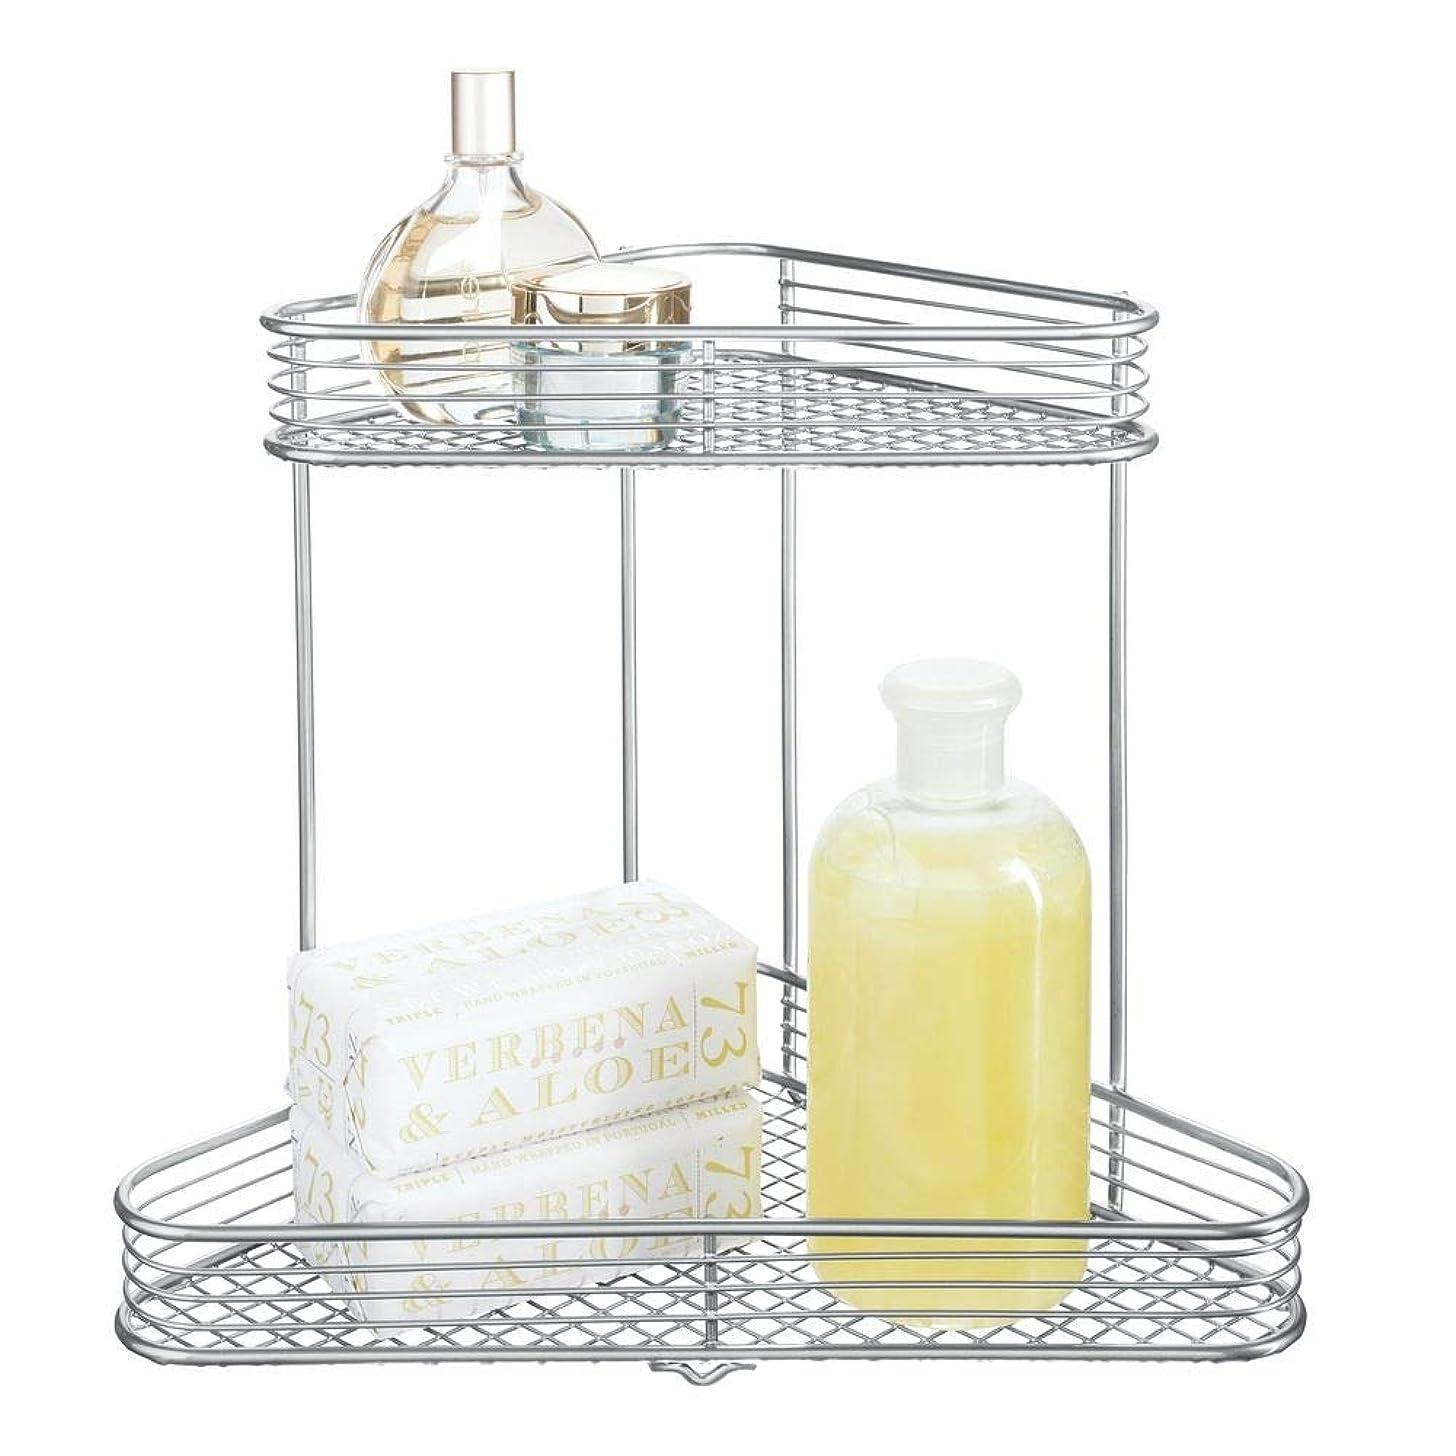 InterDesign Vienna 2-Tier Corner Shelf for Cosmetics and Toiletry Storage, Bathroom, Countertop, Desk, and Vanity,